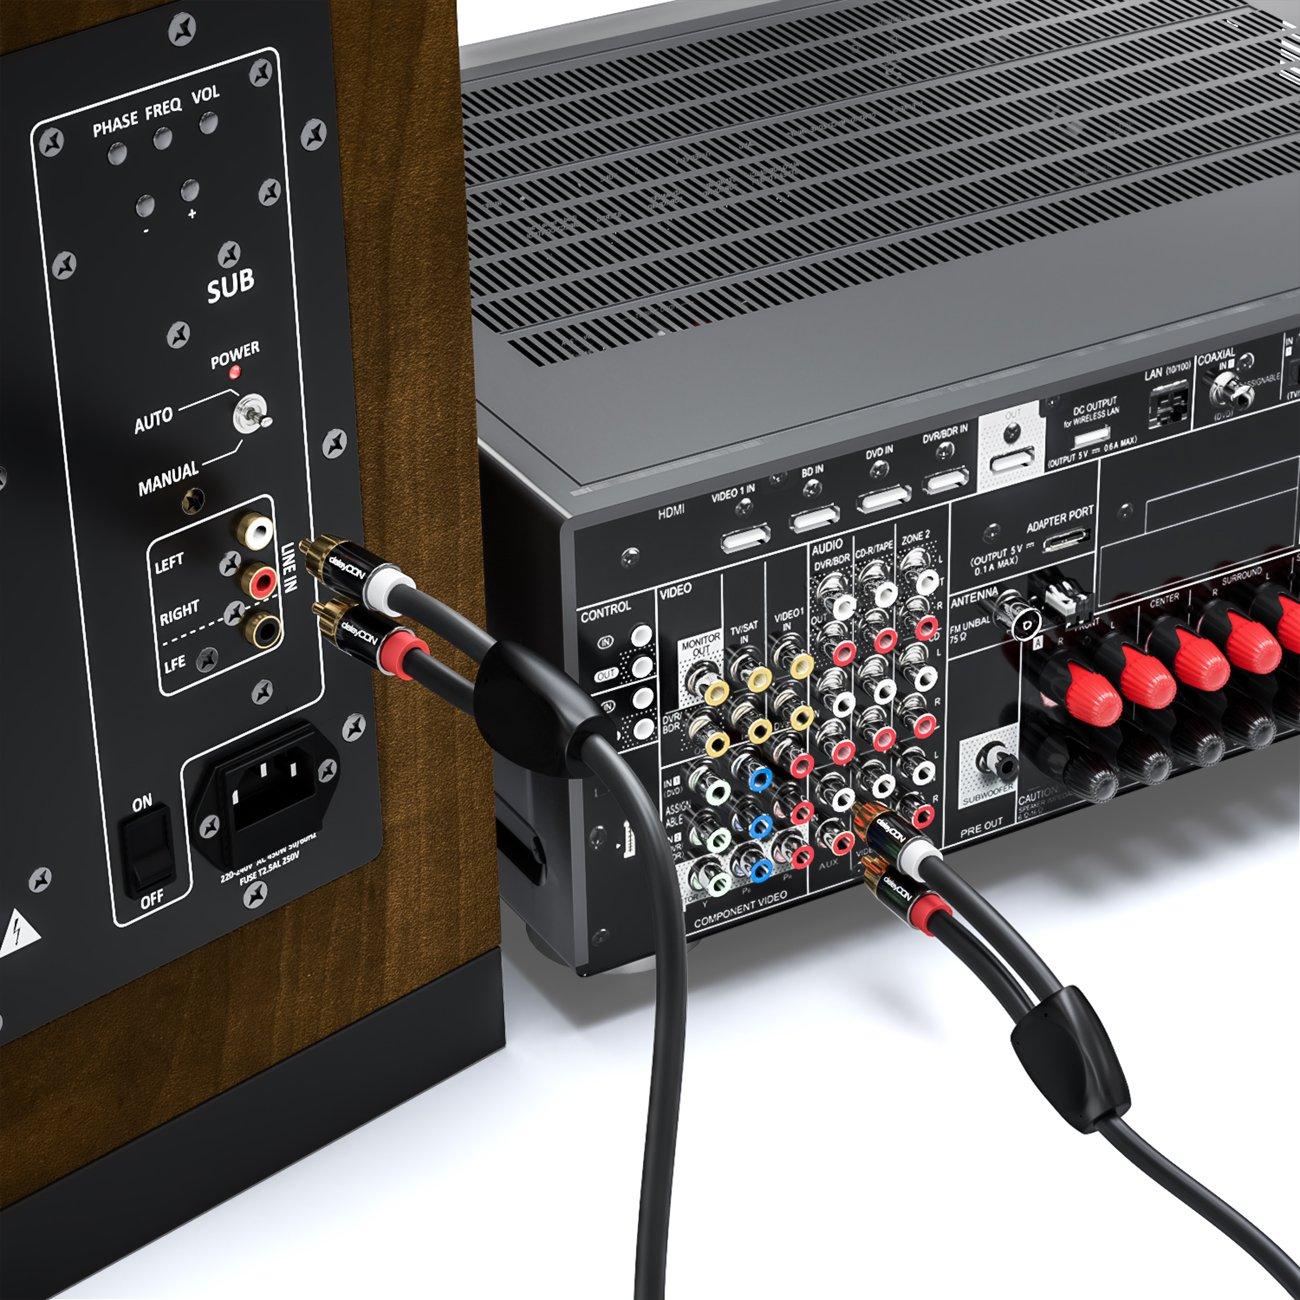 Negro deleyCON 1m Cable RCA Audio est/éreo RCA Cinch 2x RCA Enchufe a 2x Enchufe RCA